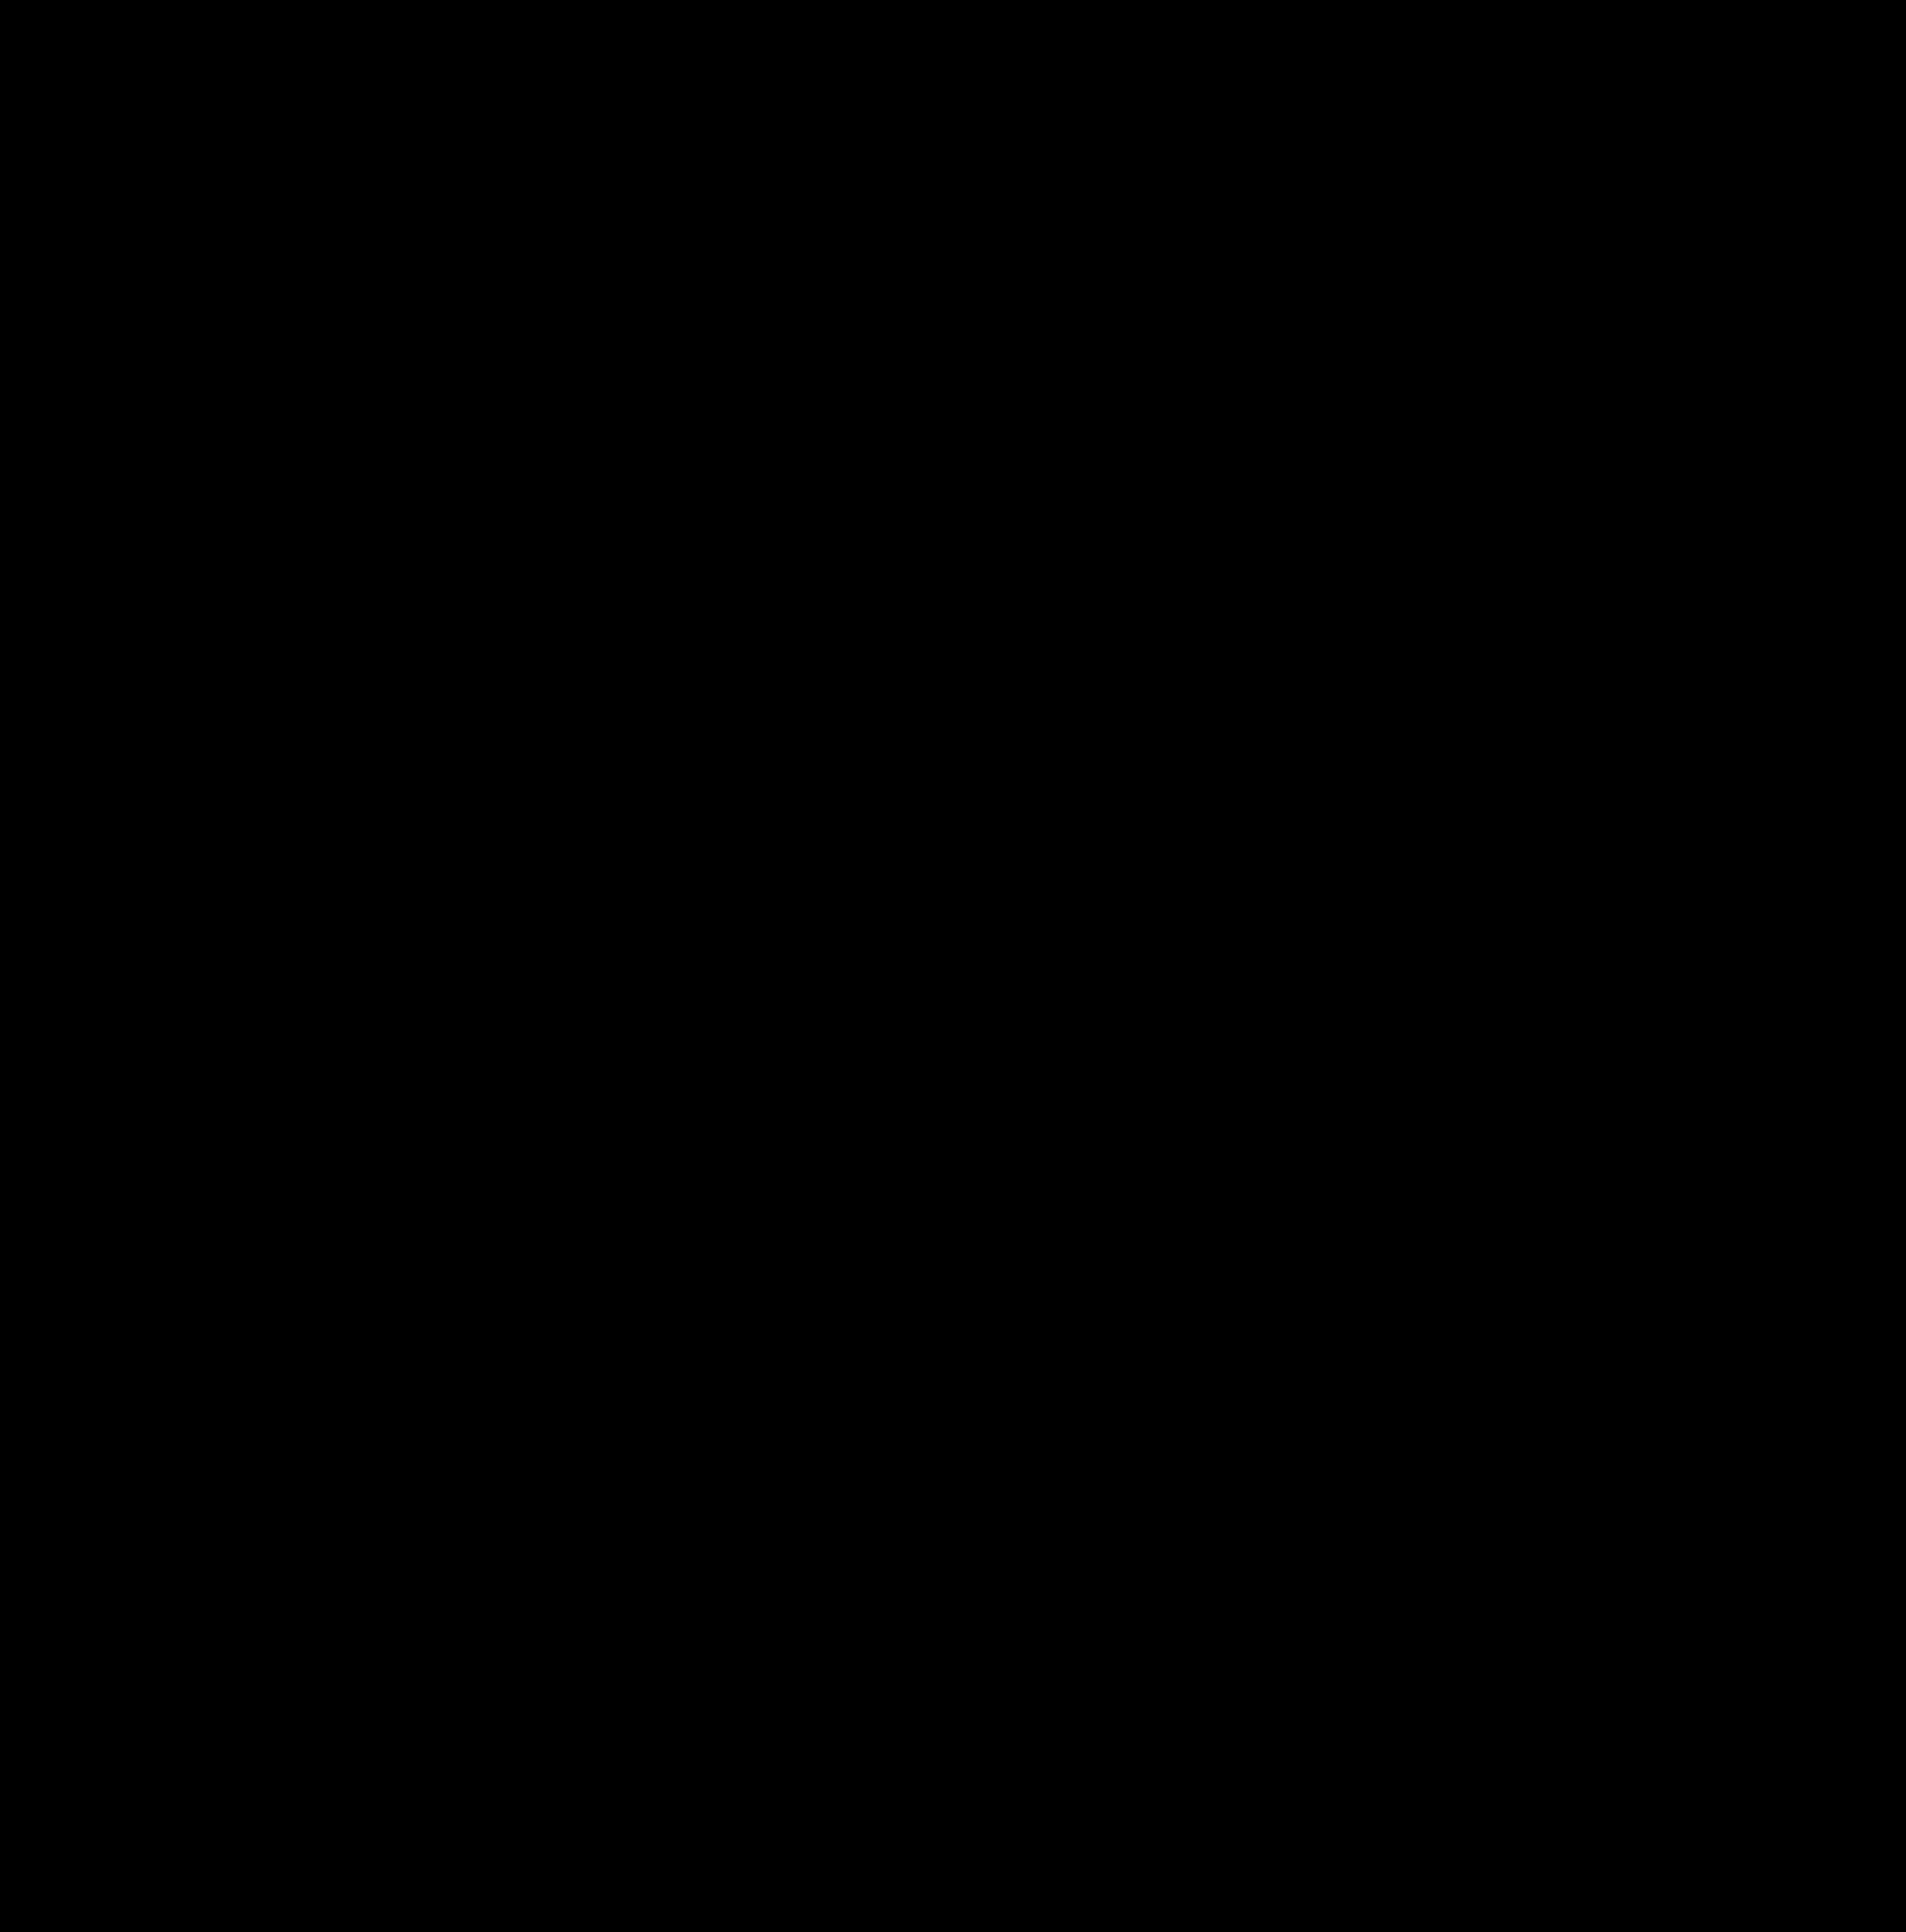 Horseshoe clipart clip art. Drawing at getdrawings com